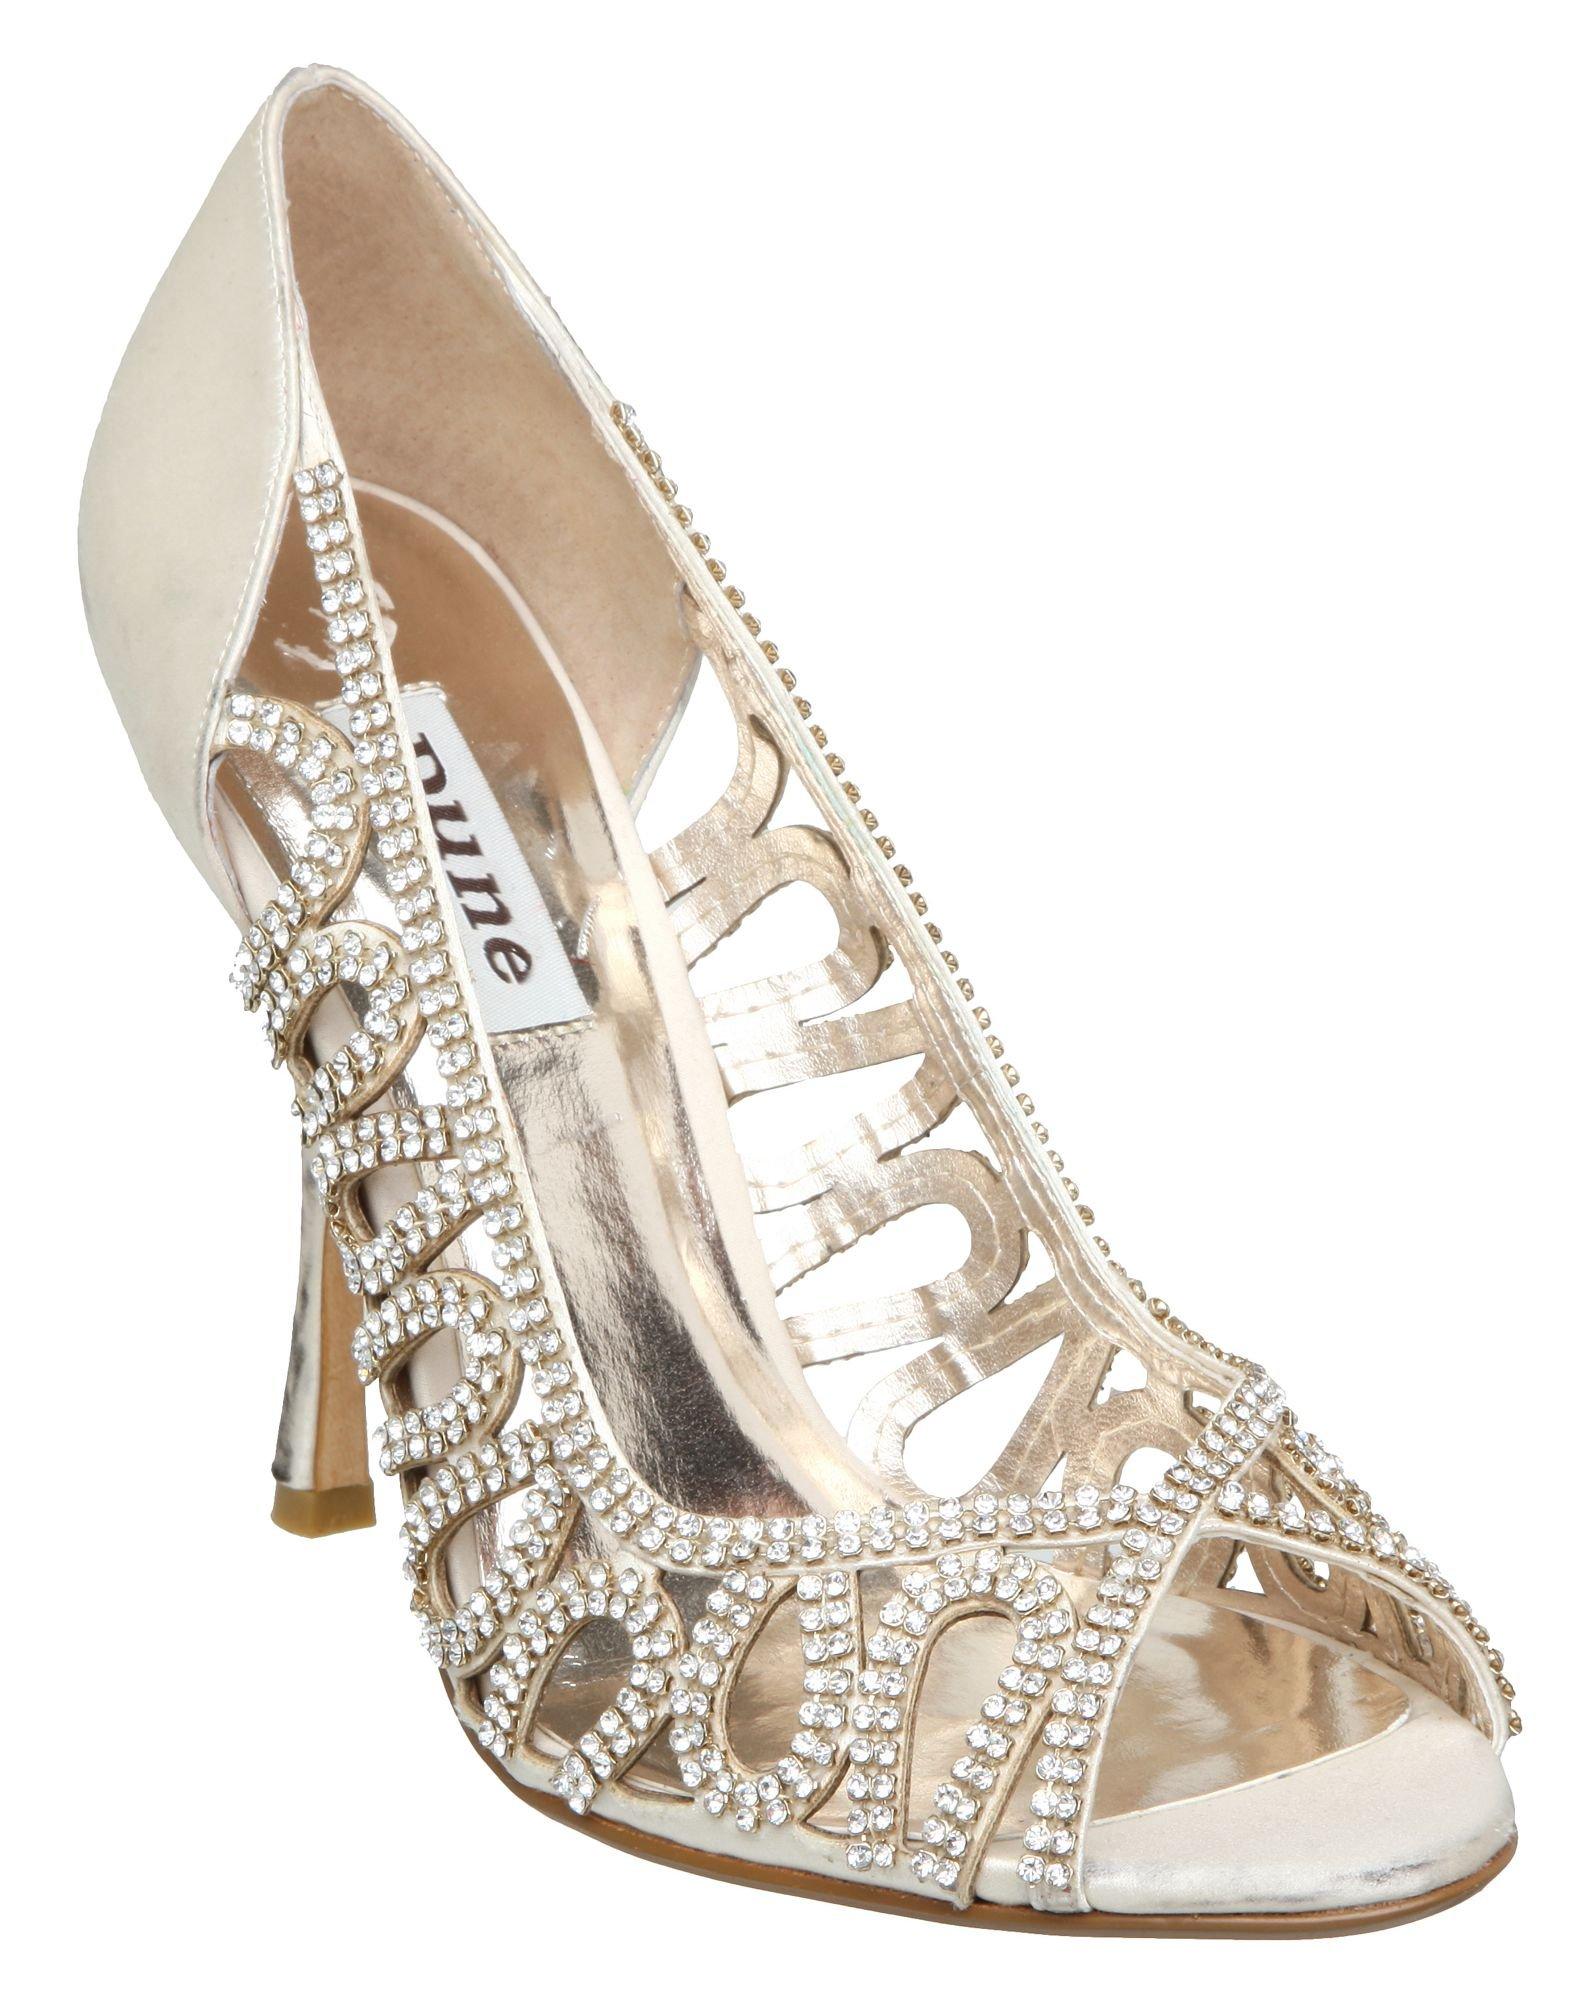 Dune Ladies Bridal Shoes